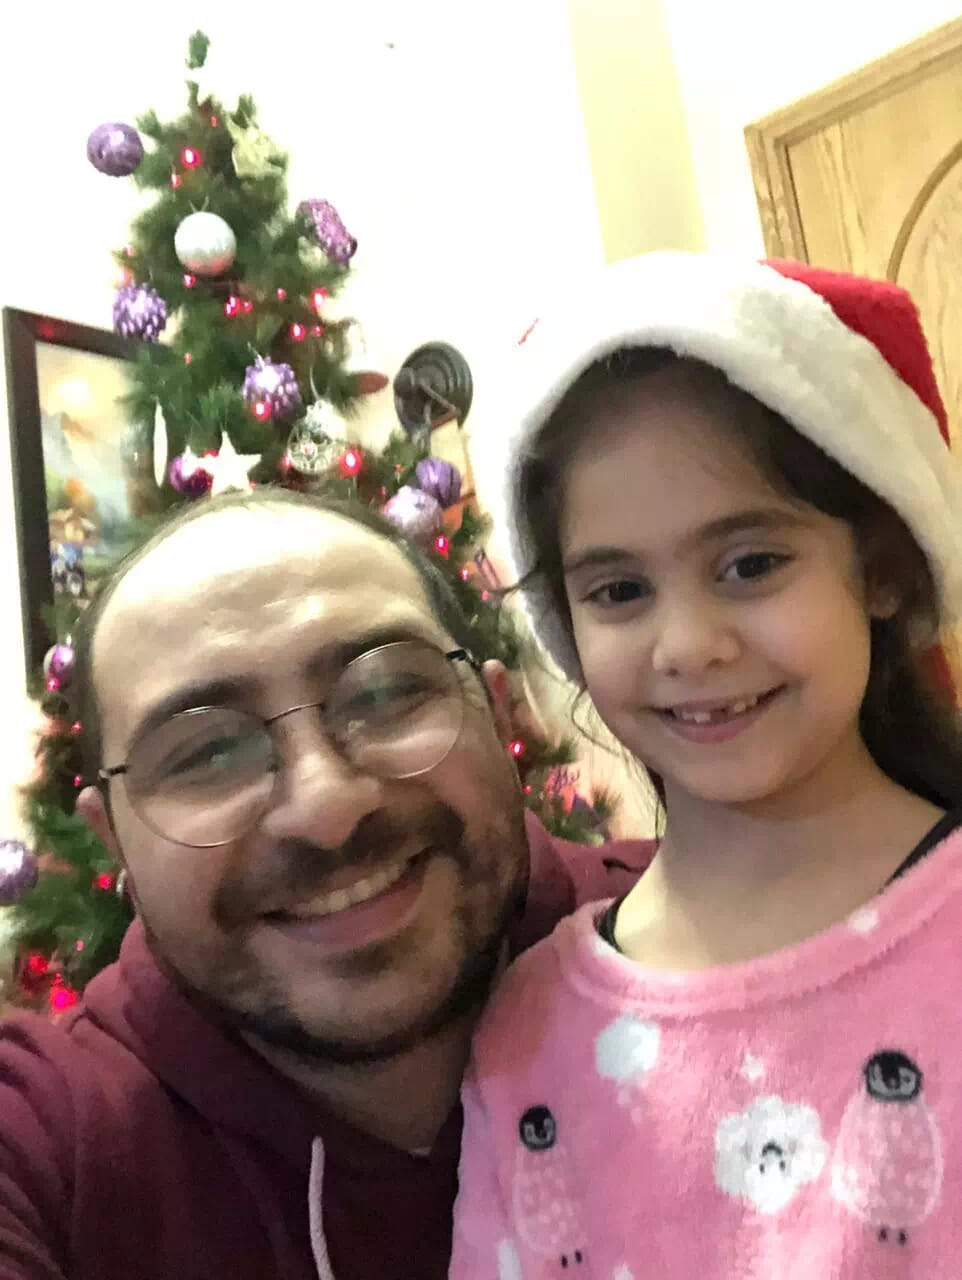 https://eundemia.sirv.com/Images/christmas/456906.webp